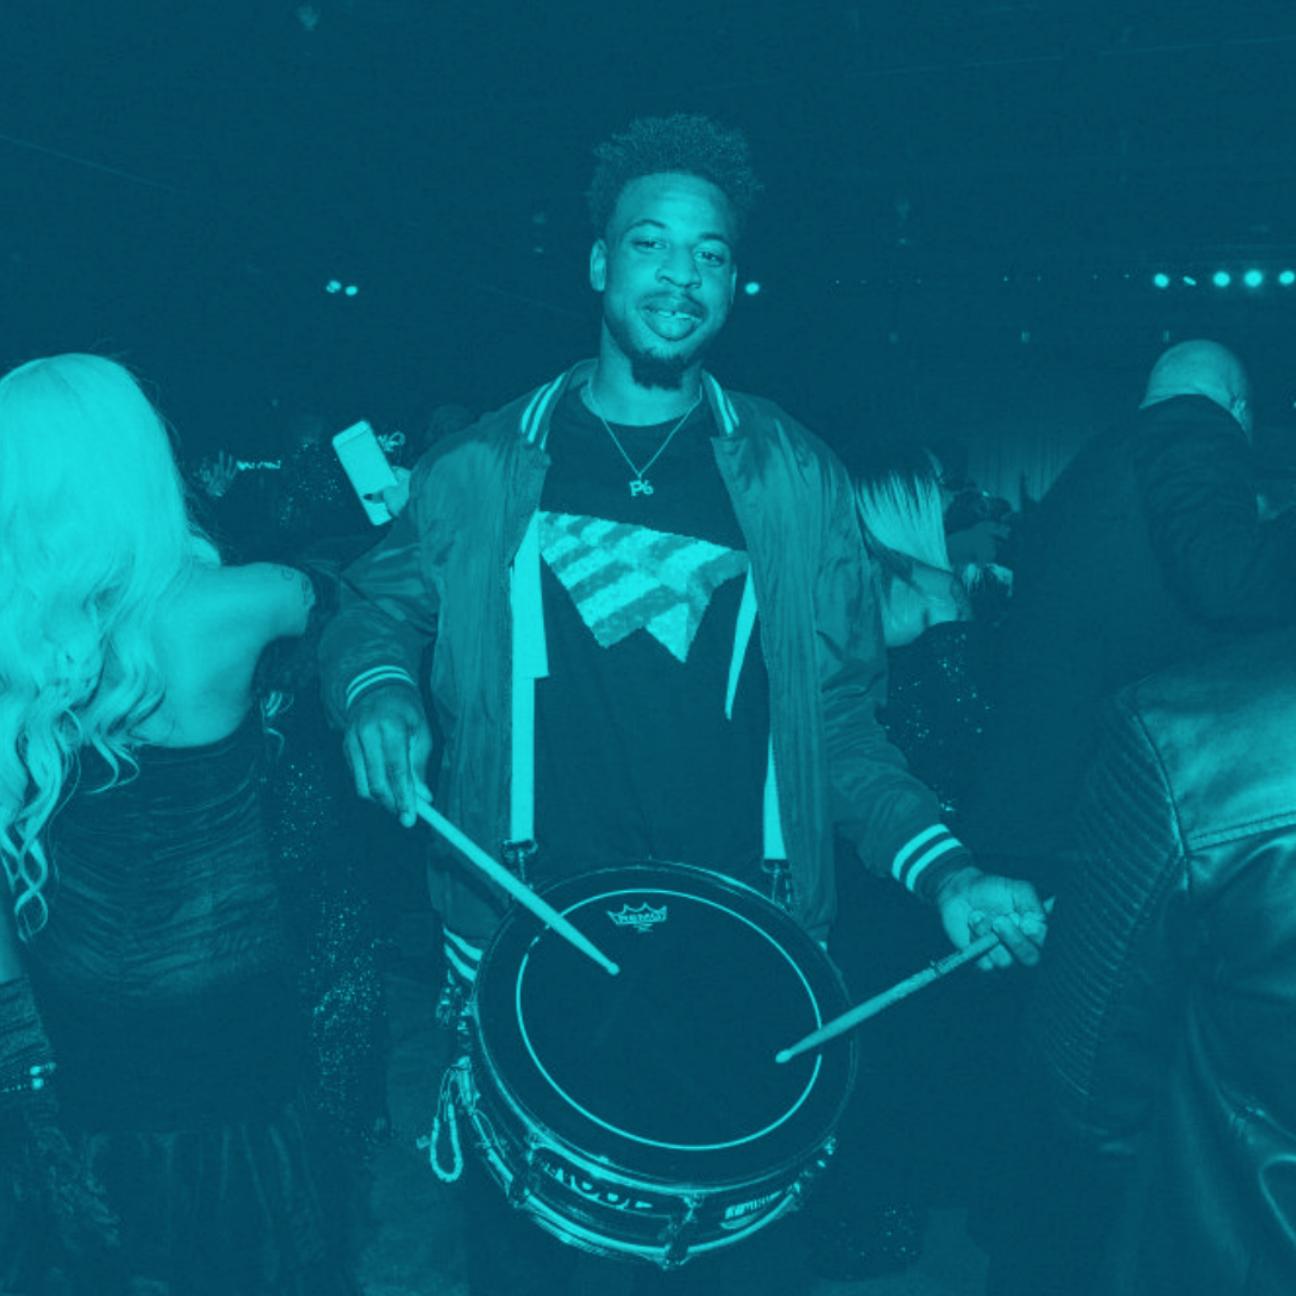 Pierre Carter - Snare Drum